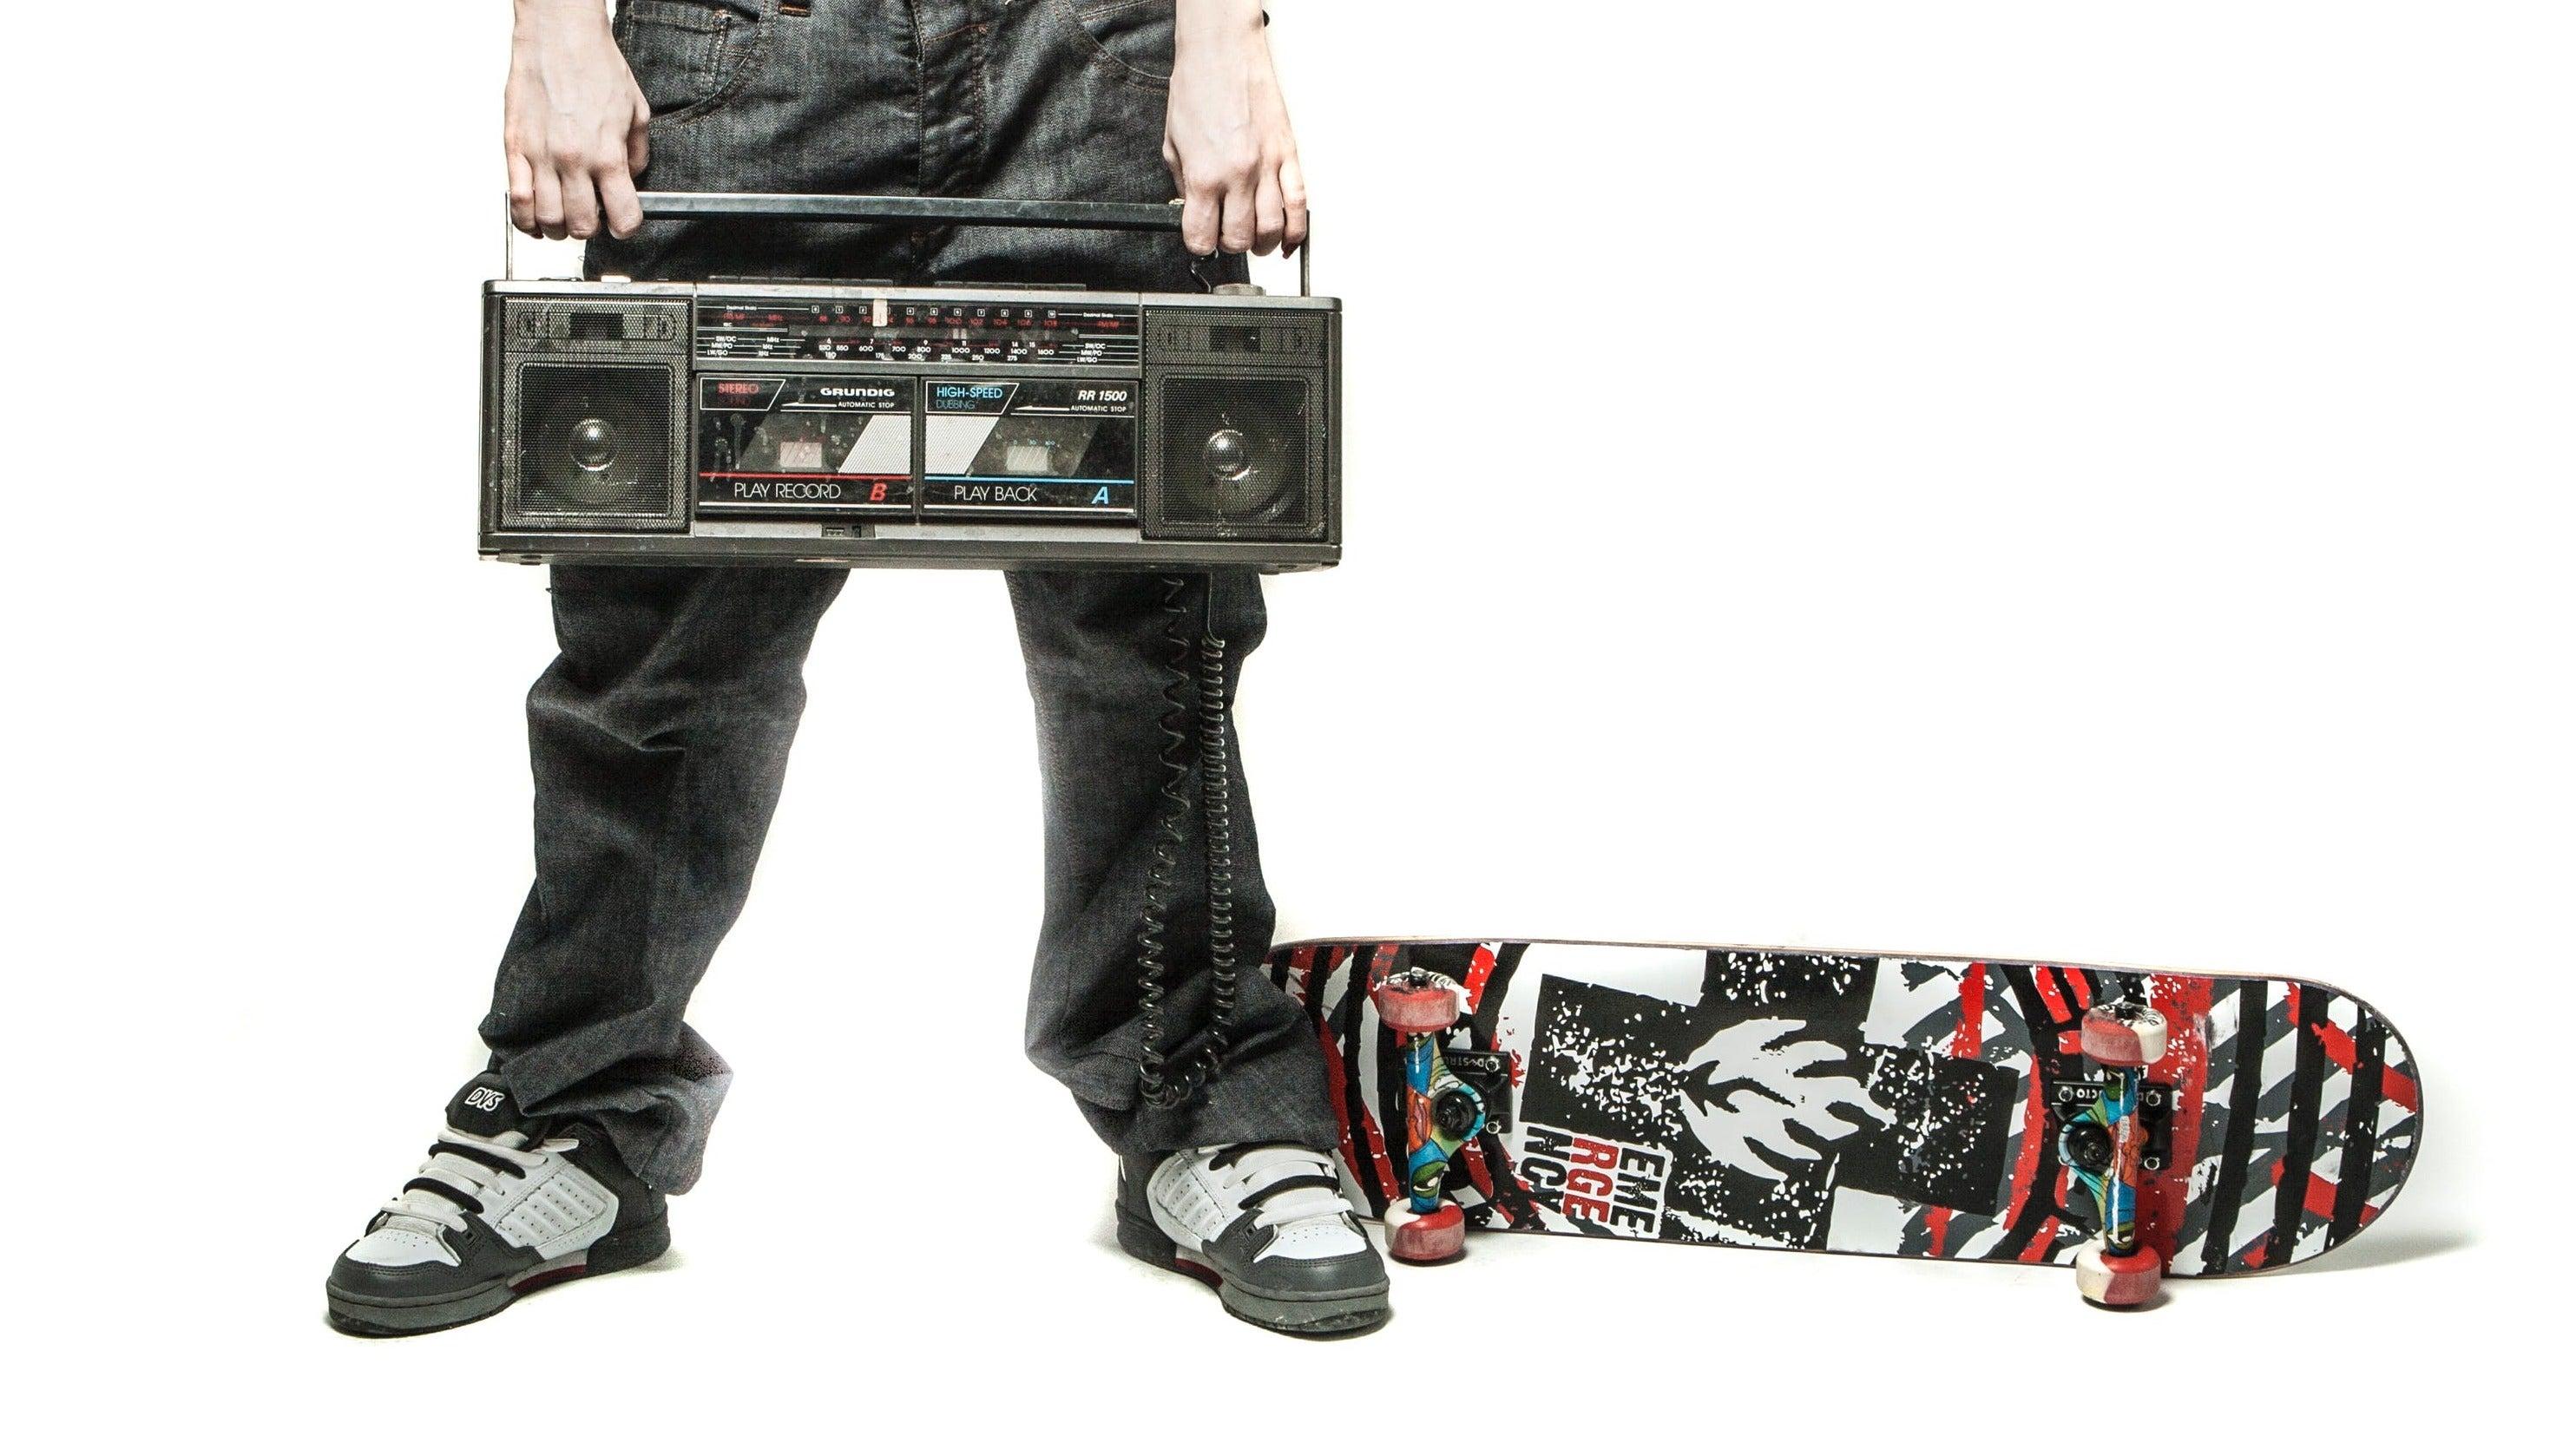 The Original Tony Hawk's Pro Skater Soundtrack Is Still A Blast